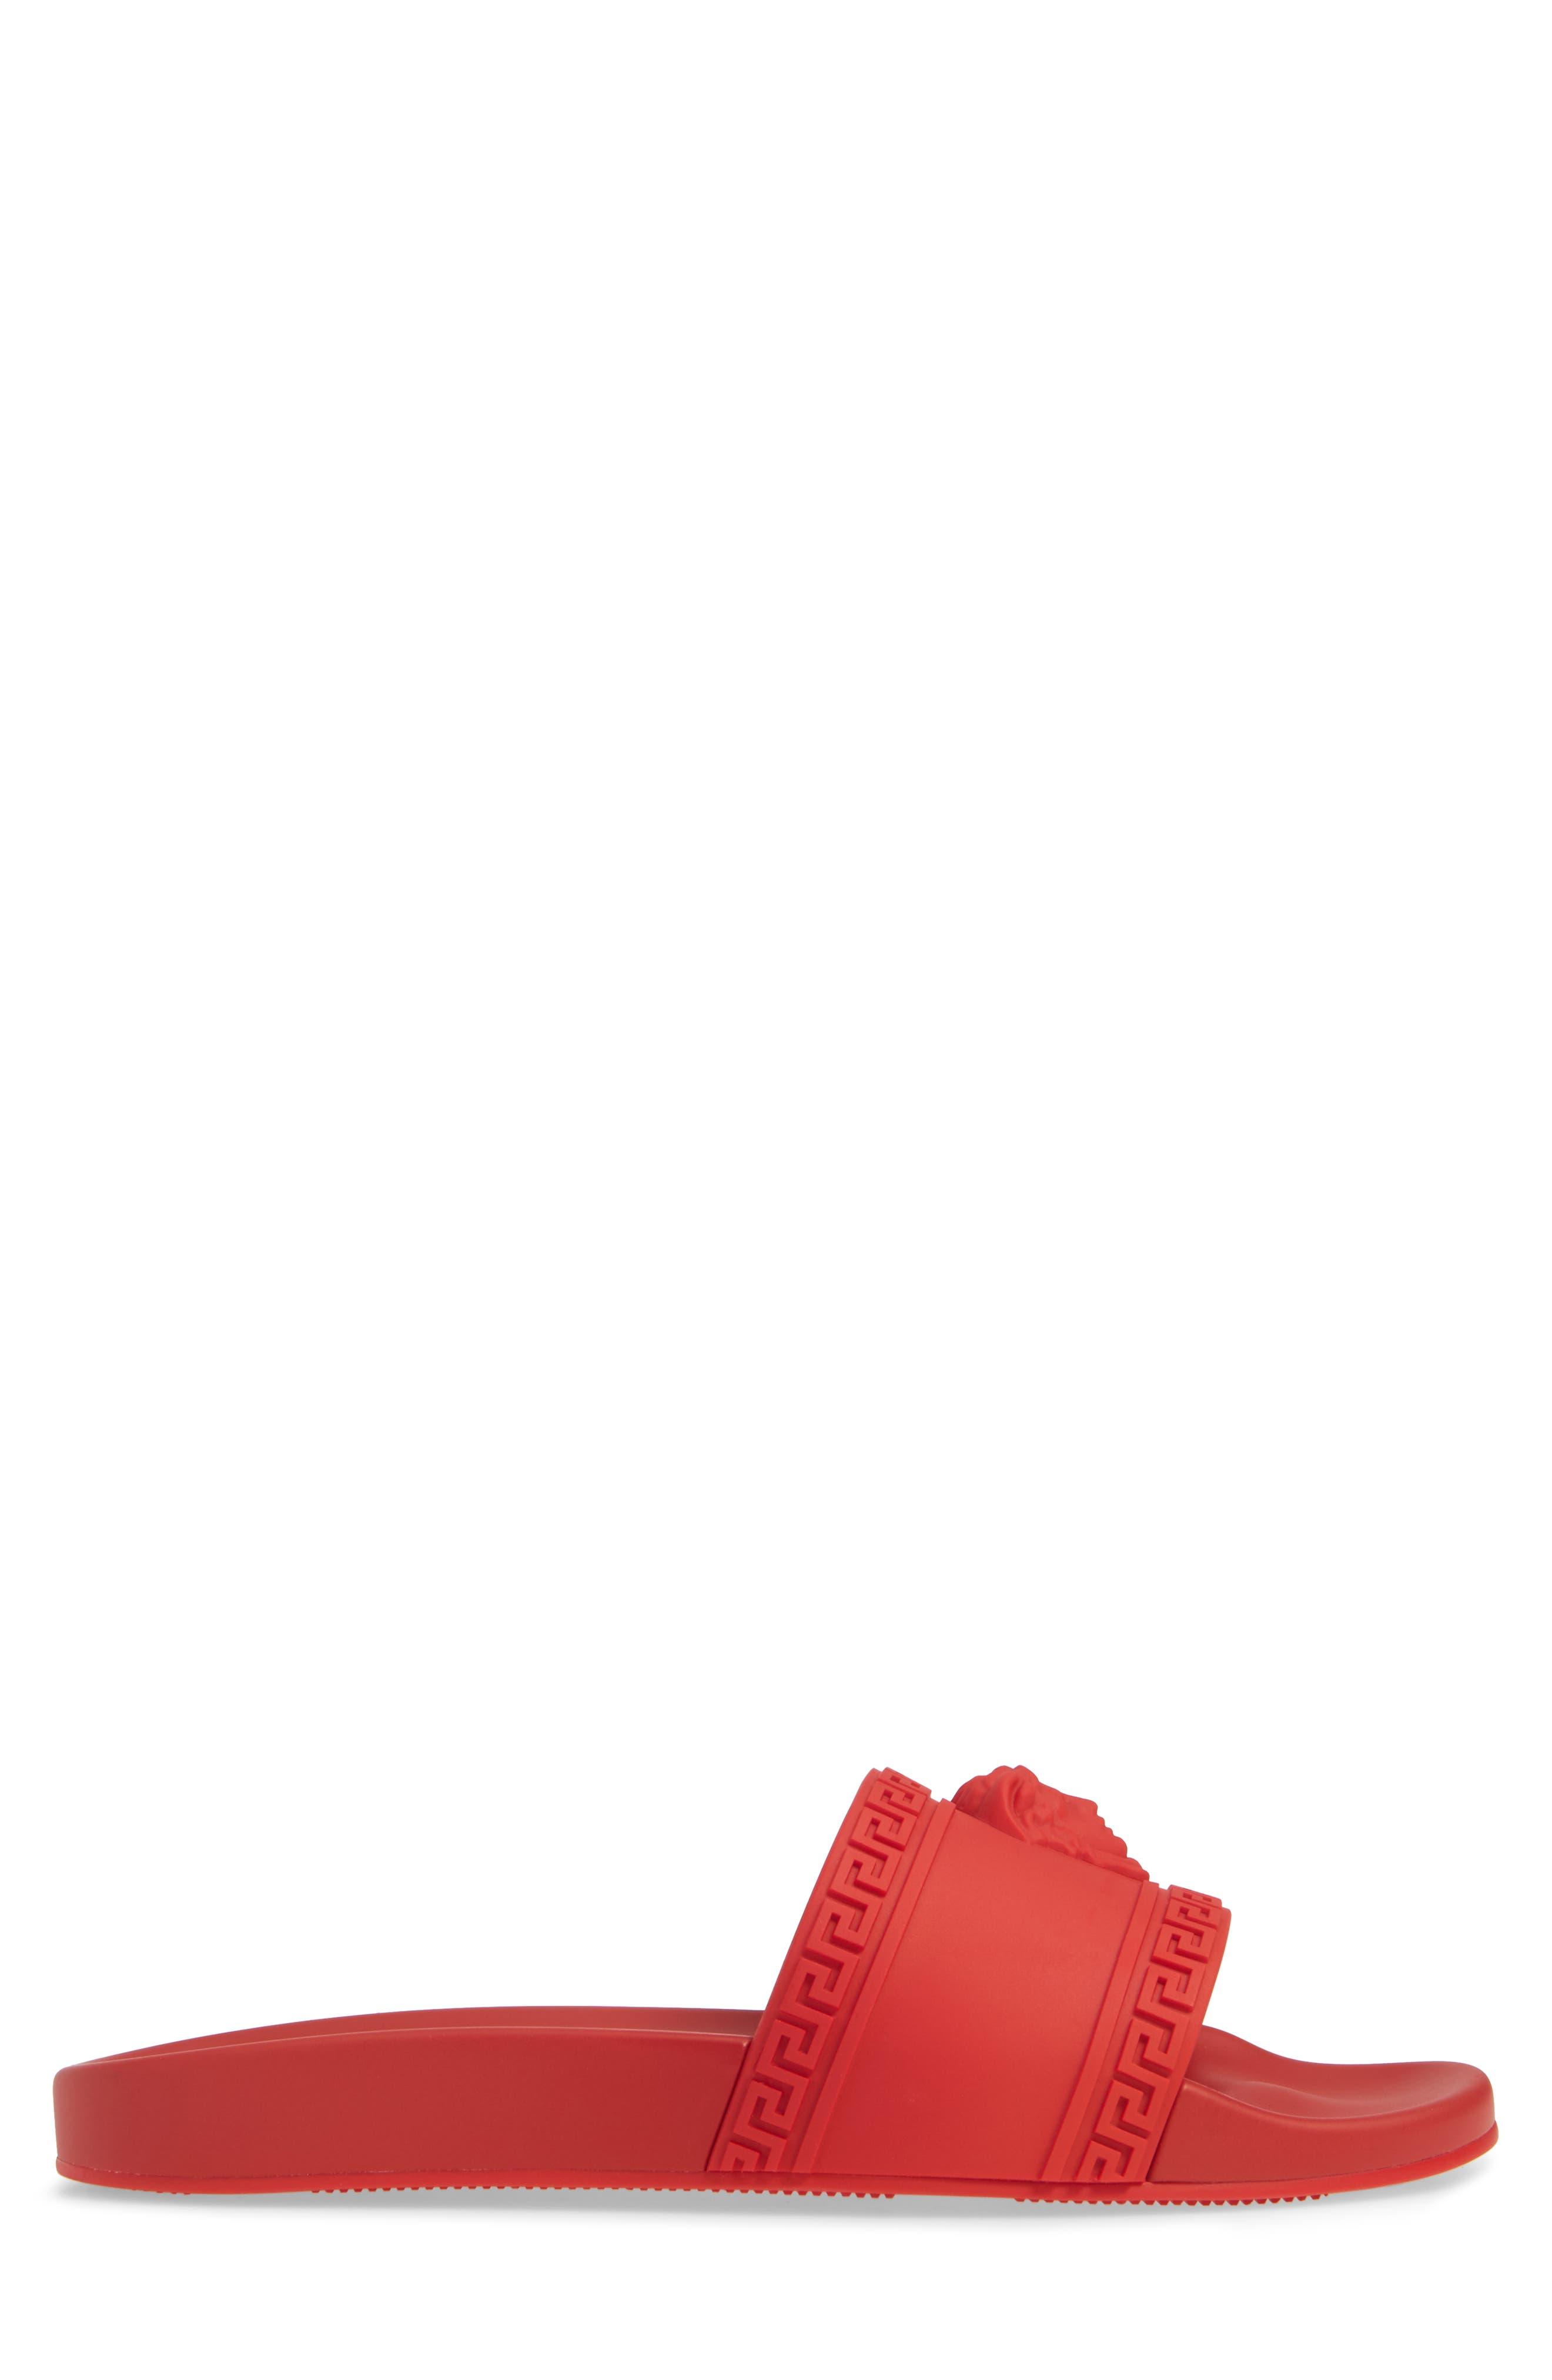 Palazzo Medusa Slide Sandal,                             Alternate thumbnail 3, color,                             RED